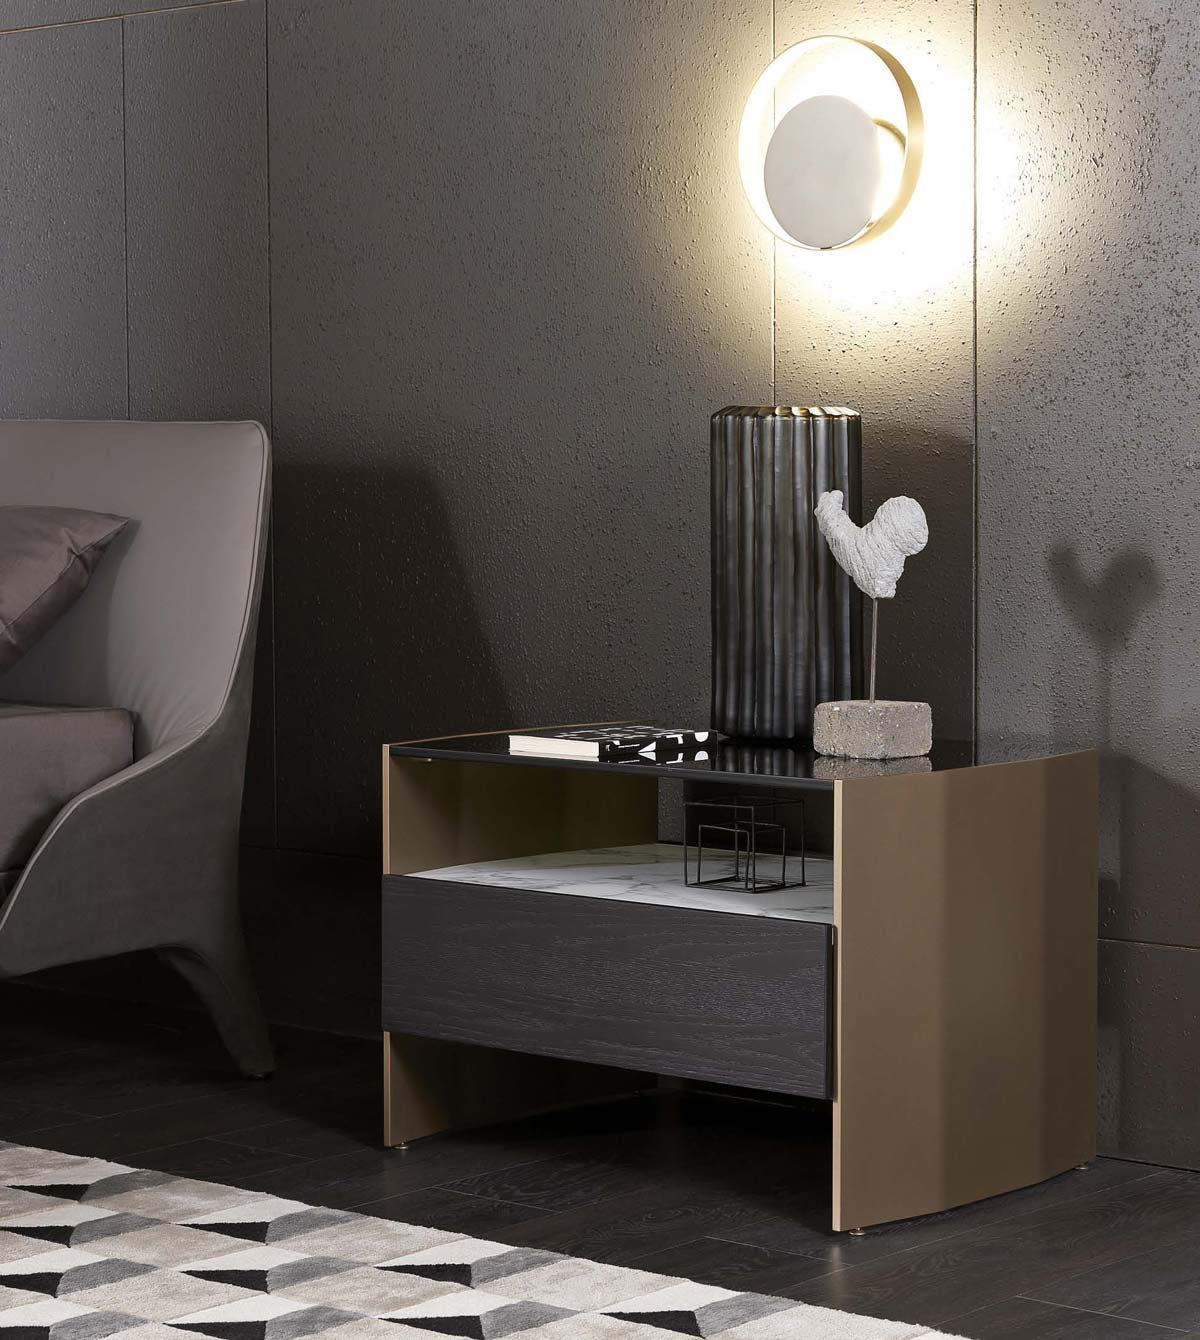 MisuraEmme, Milvian night table, design by Francesco Lucchese